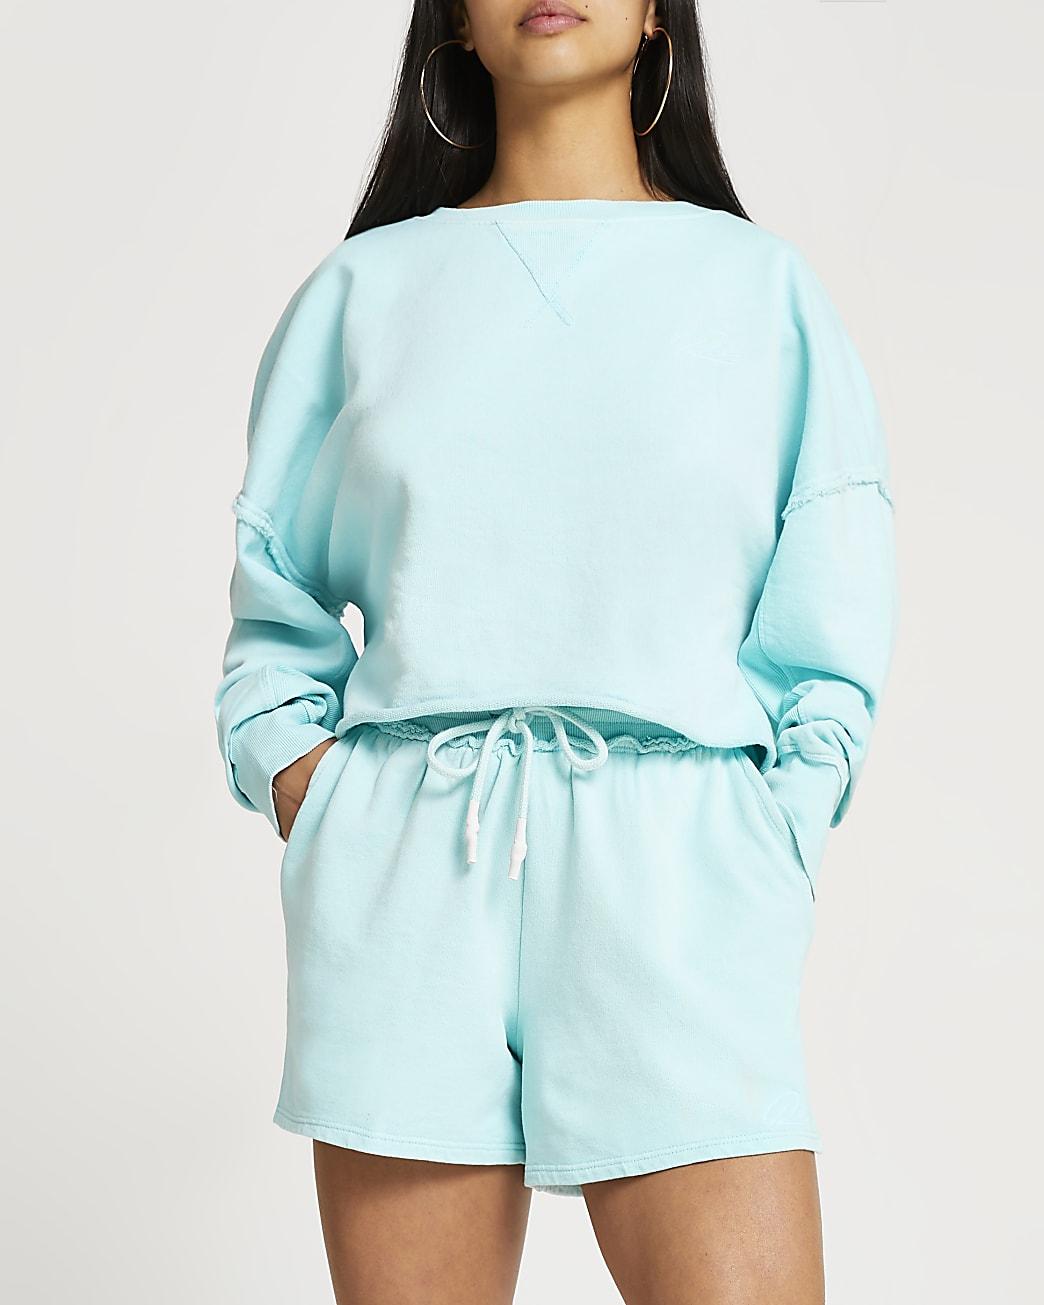 Petite blue exposed seam sweatshirt